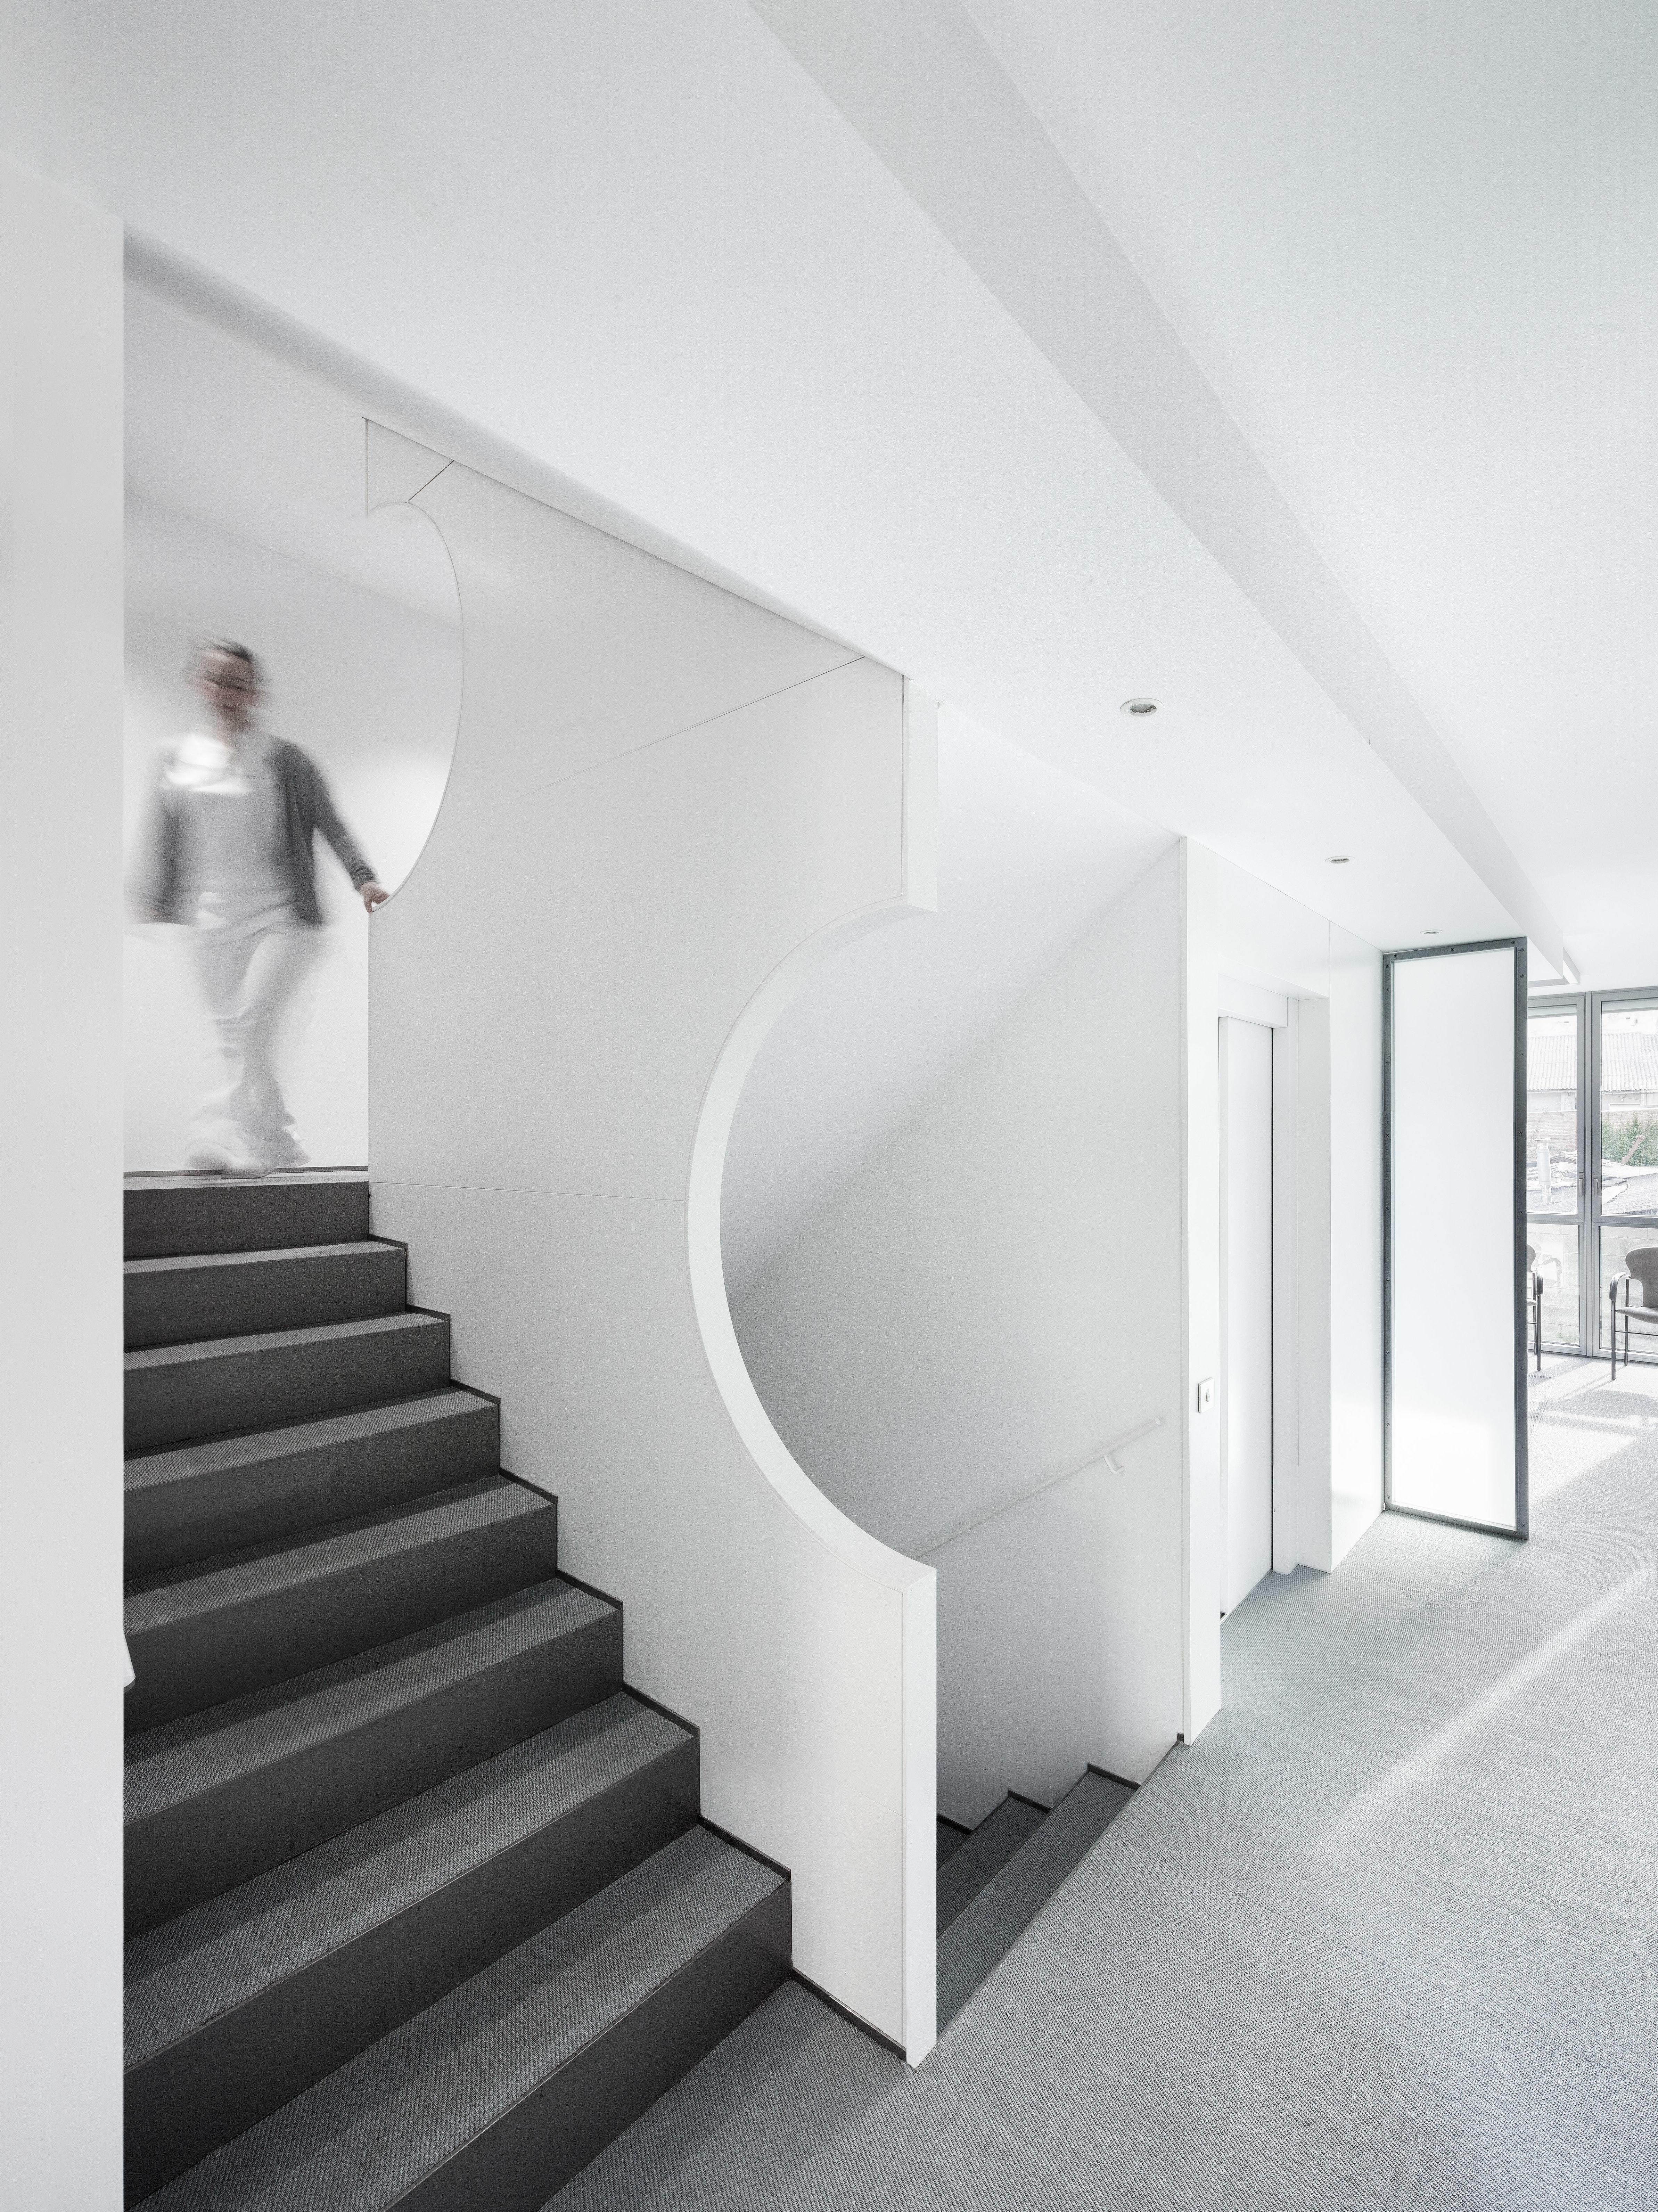 Foto 2 de Centros de estética en Barcelona | Serena Clinic